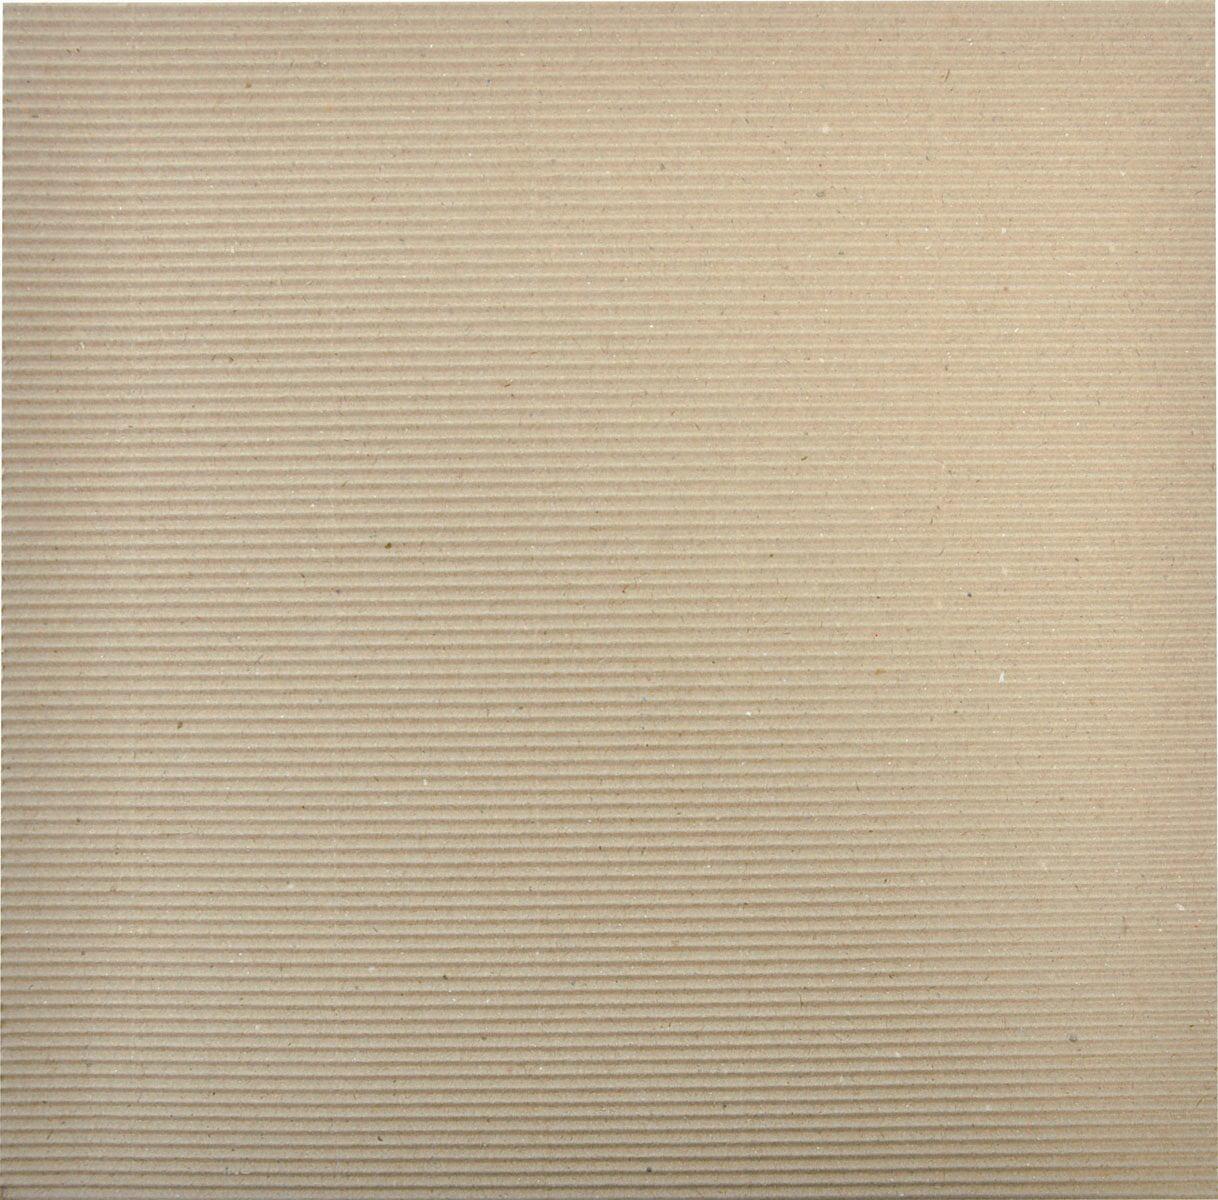 Kaiser Craft Corrugated Cardboard Sheets Walmart Com